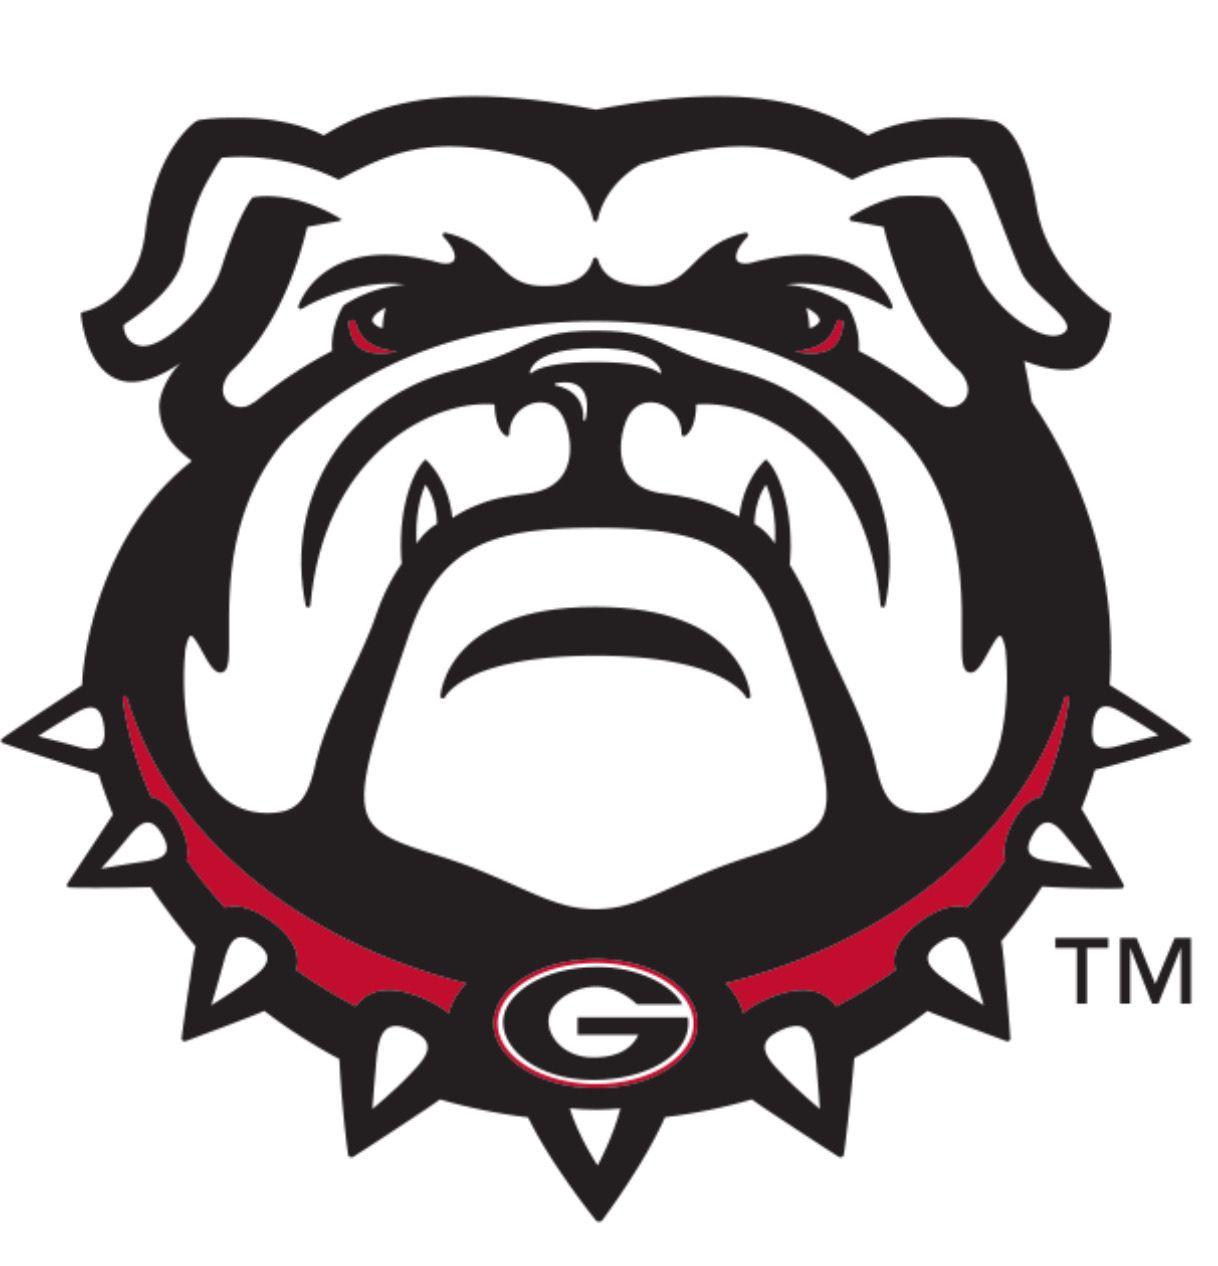 small resolution of high school mascots car tags university of georgia business signs georgia bulldogs